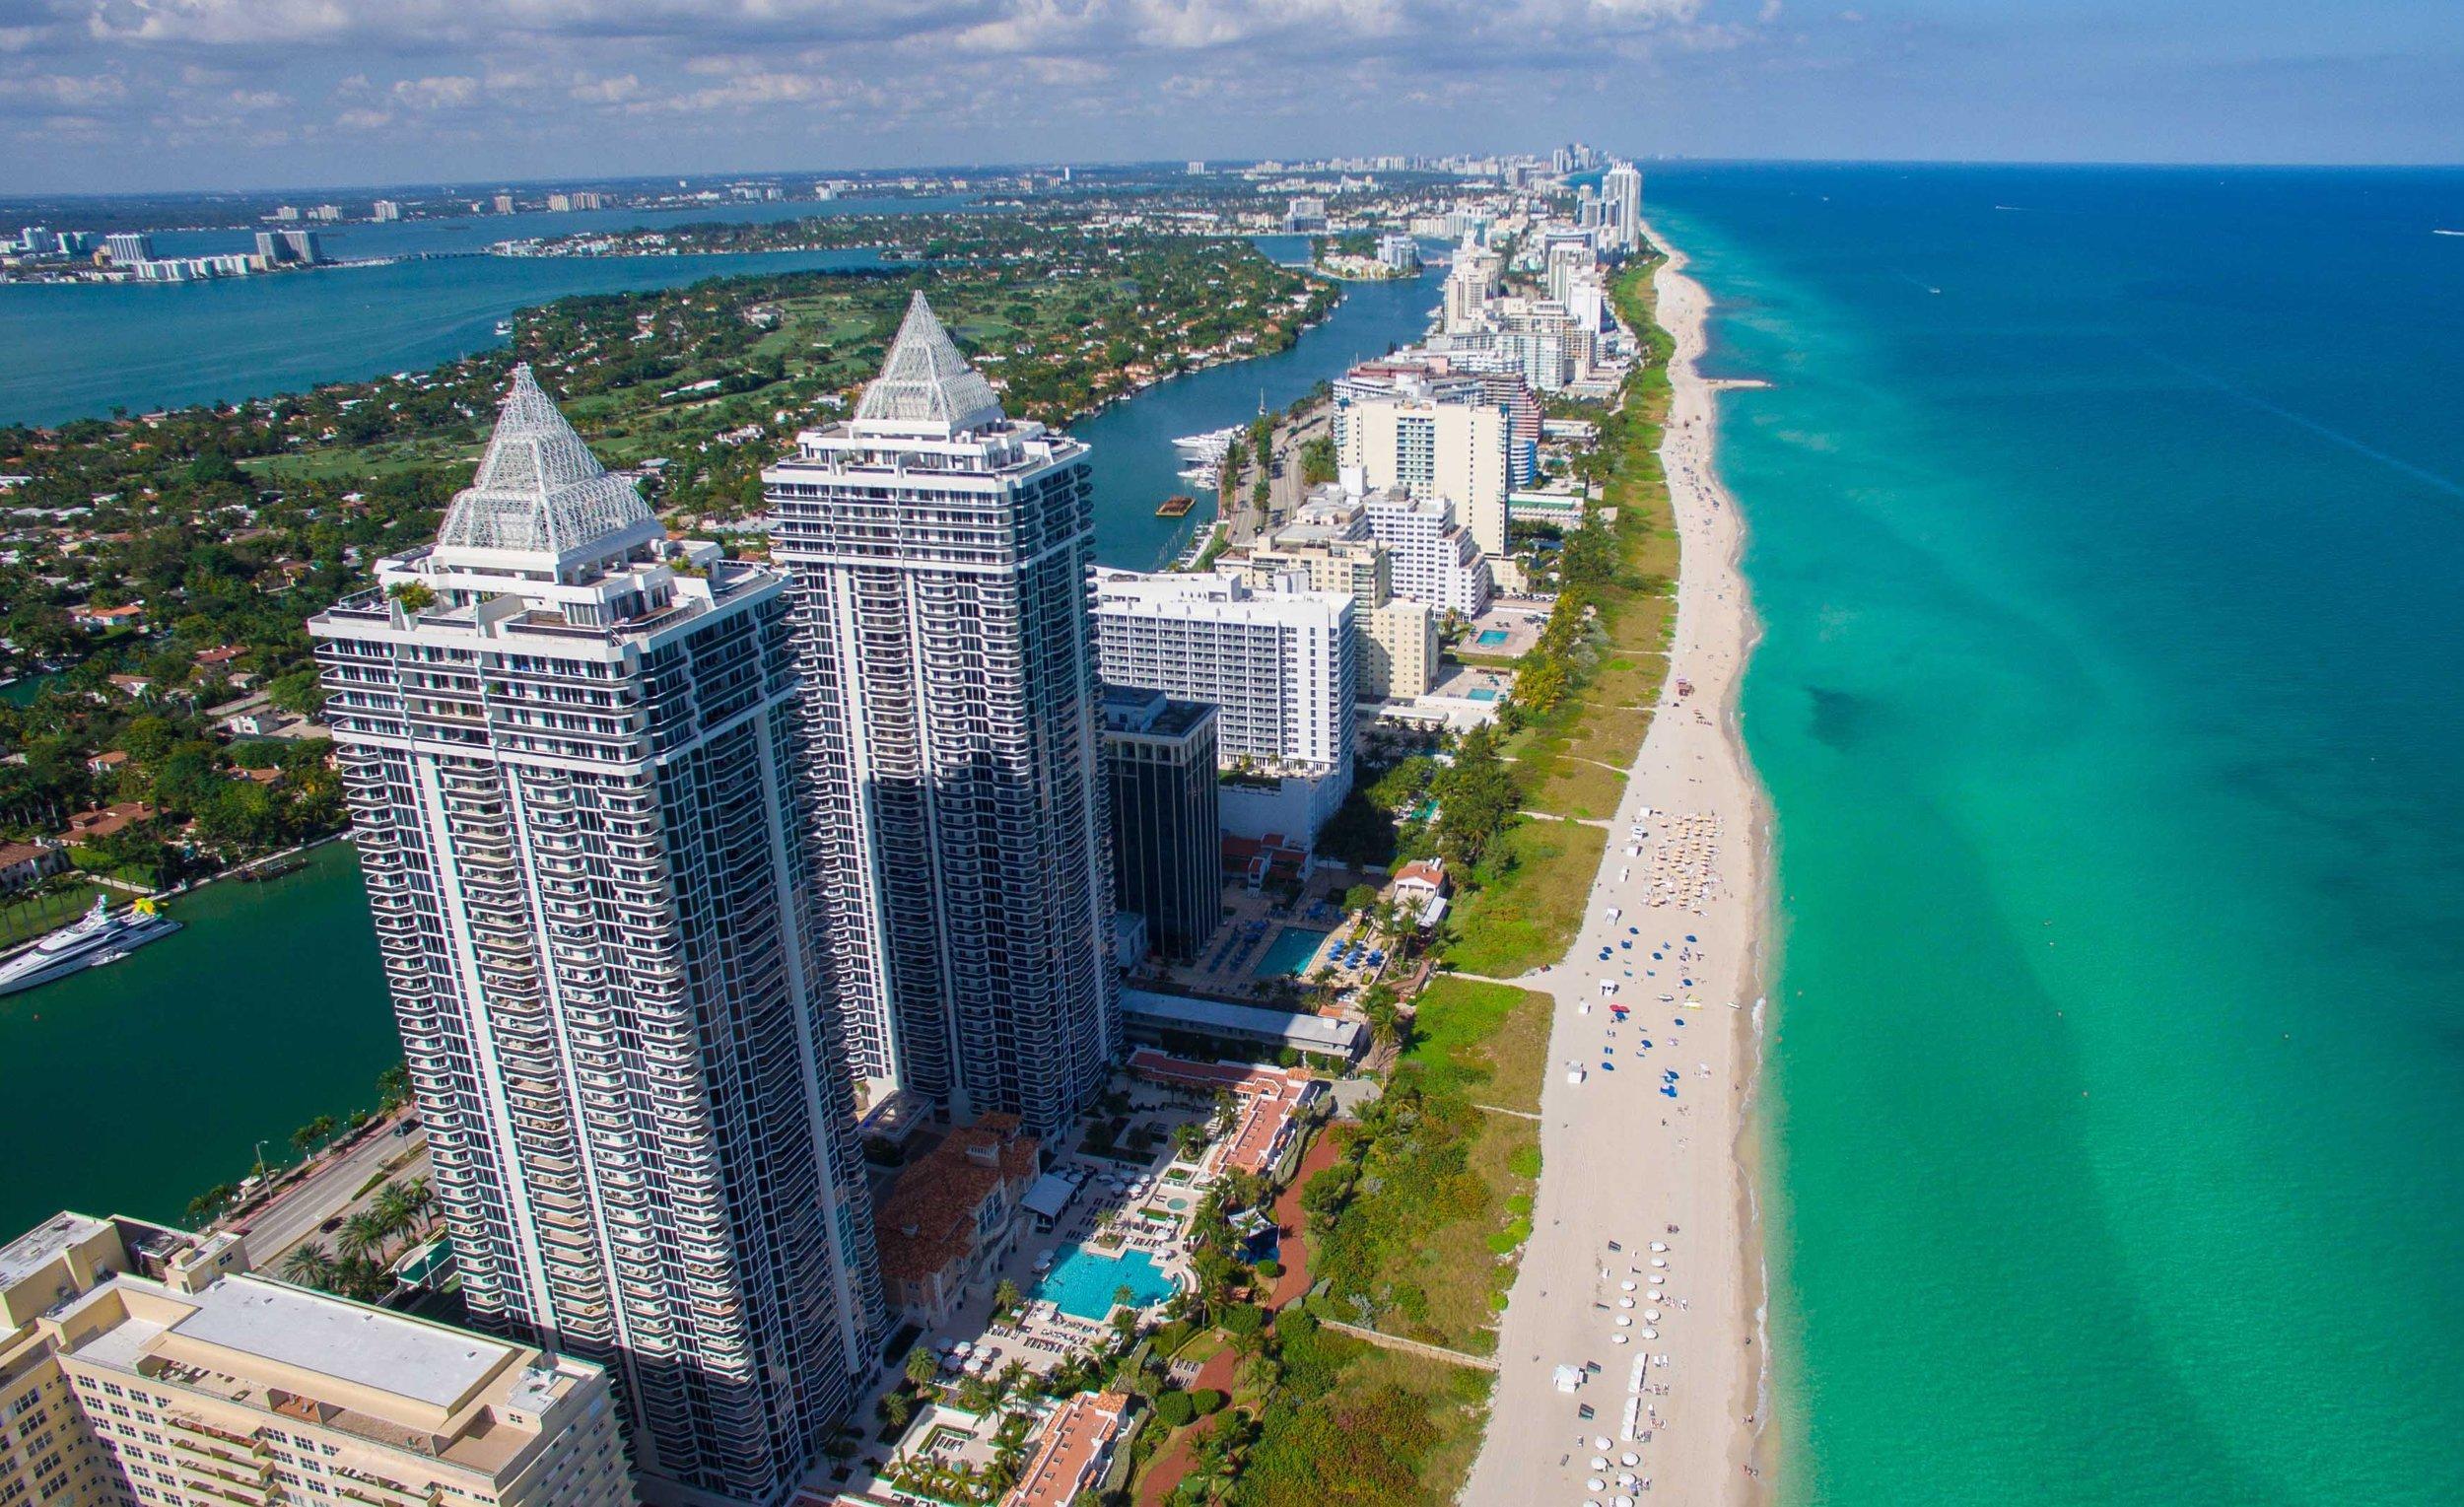 Explore Miami and South Beach